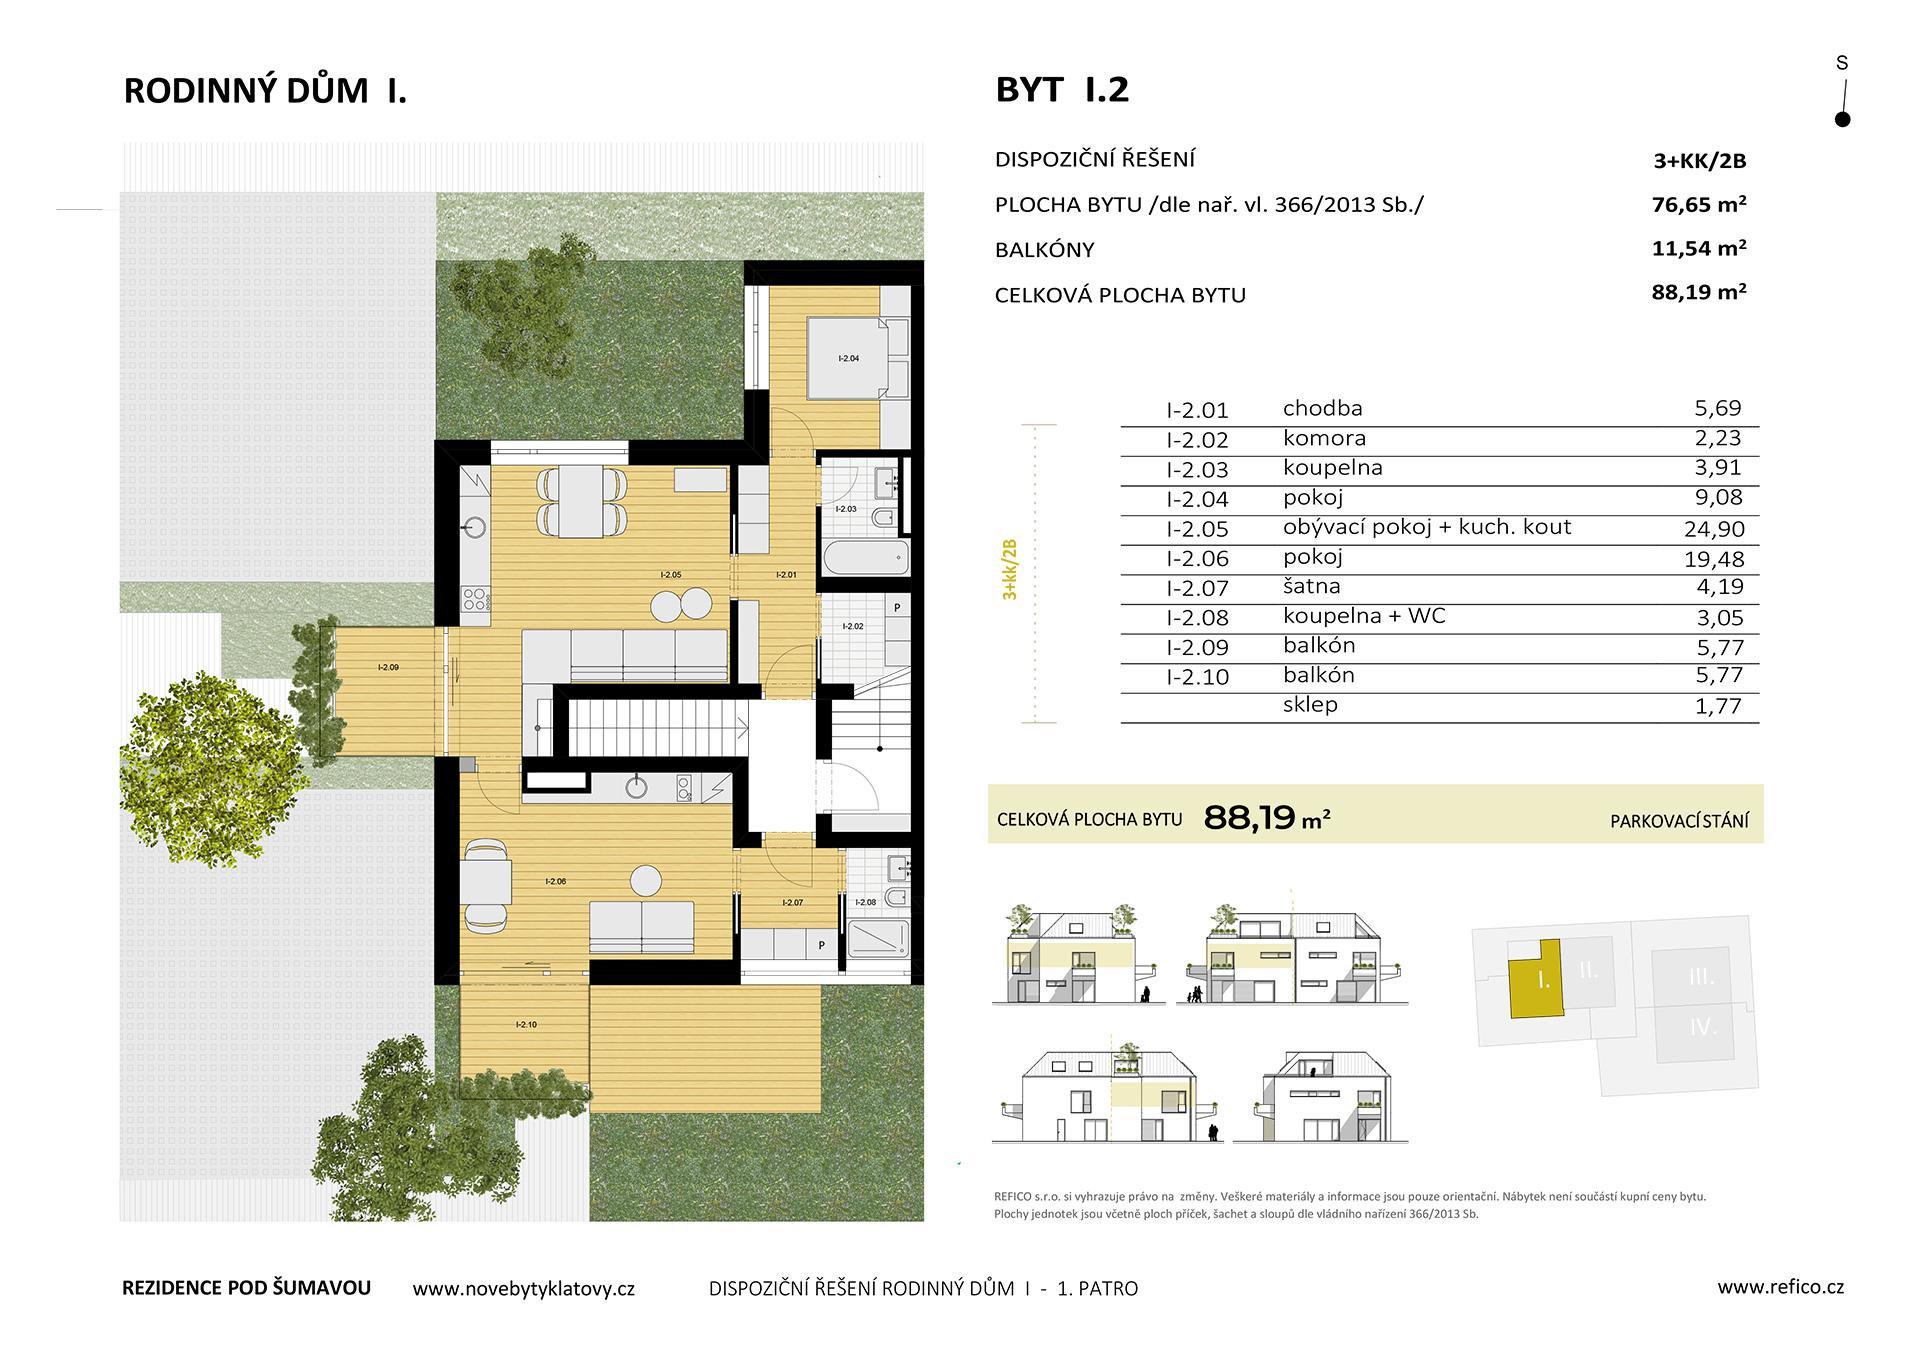 Dům I., byt 2, 1. patro, dvougenerační byt 3+KK/2B, alt. 2+KK/B + garsoniéra/B